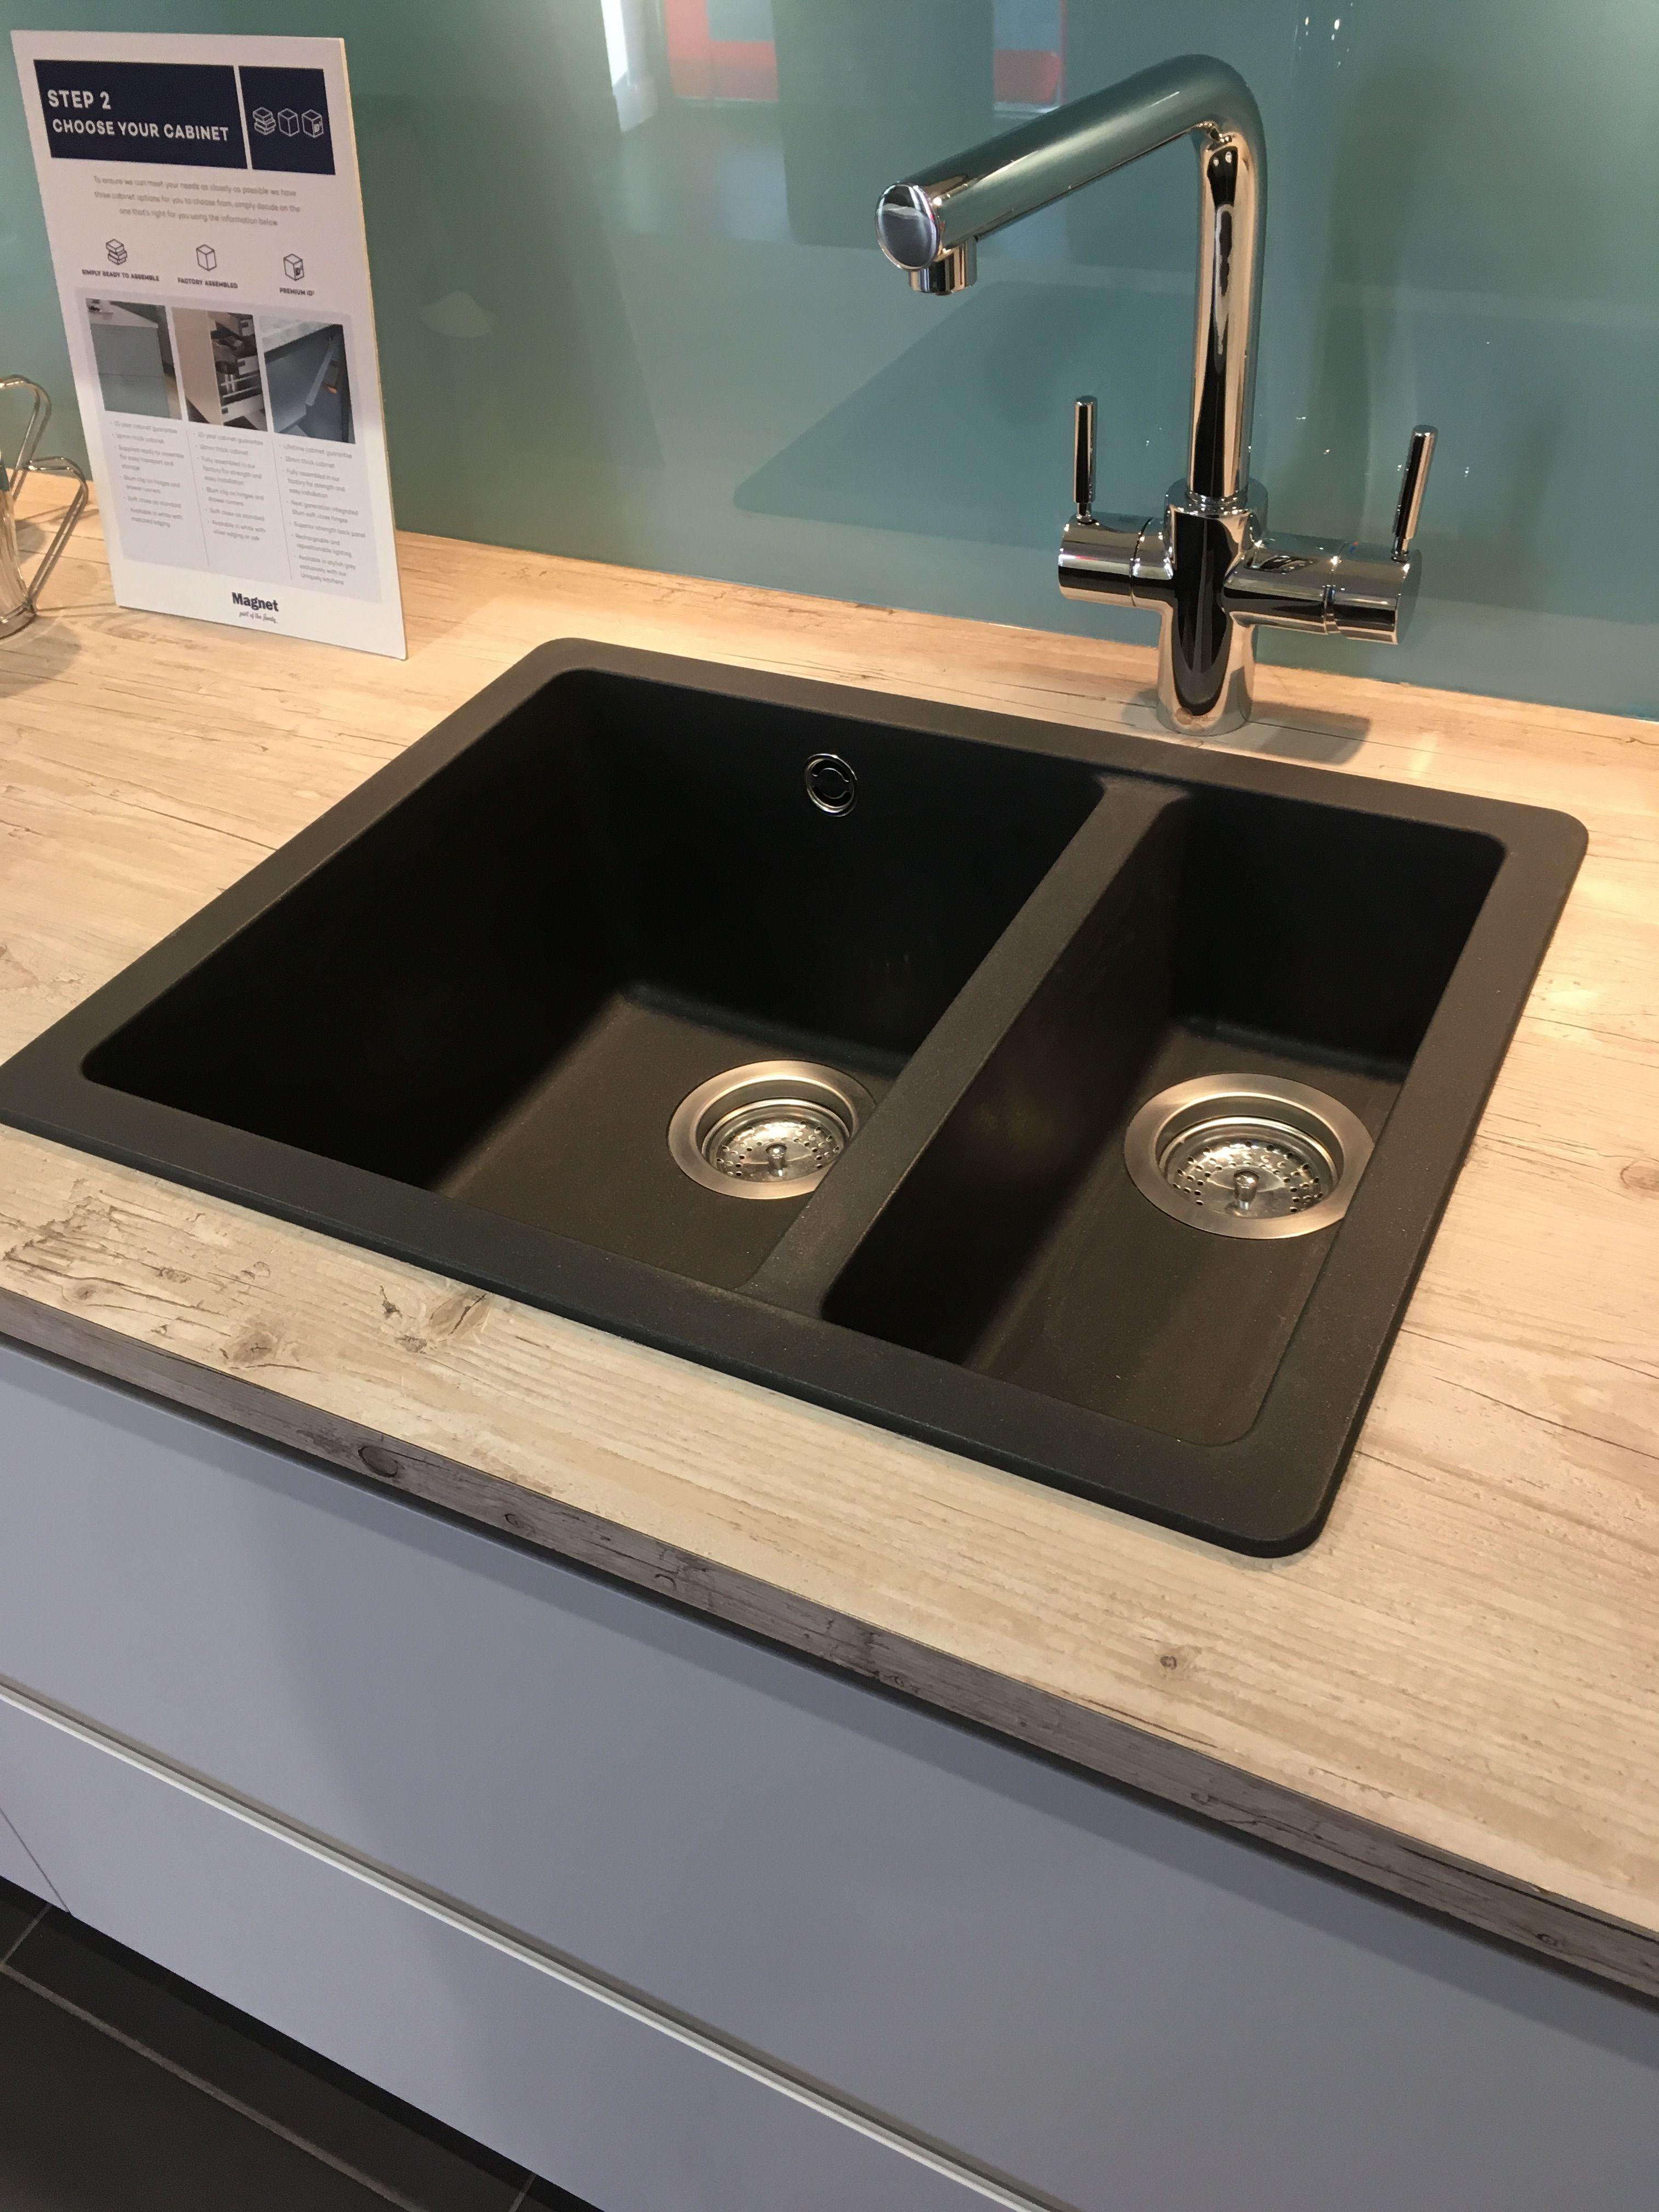 Composite sink 1.5 bowl Magnet | Kitchen | Pinterest | Sinks and Bowls